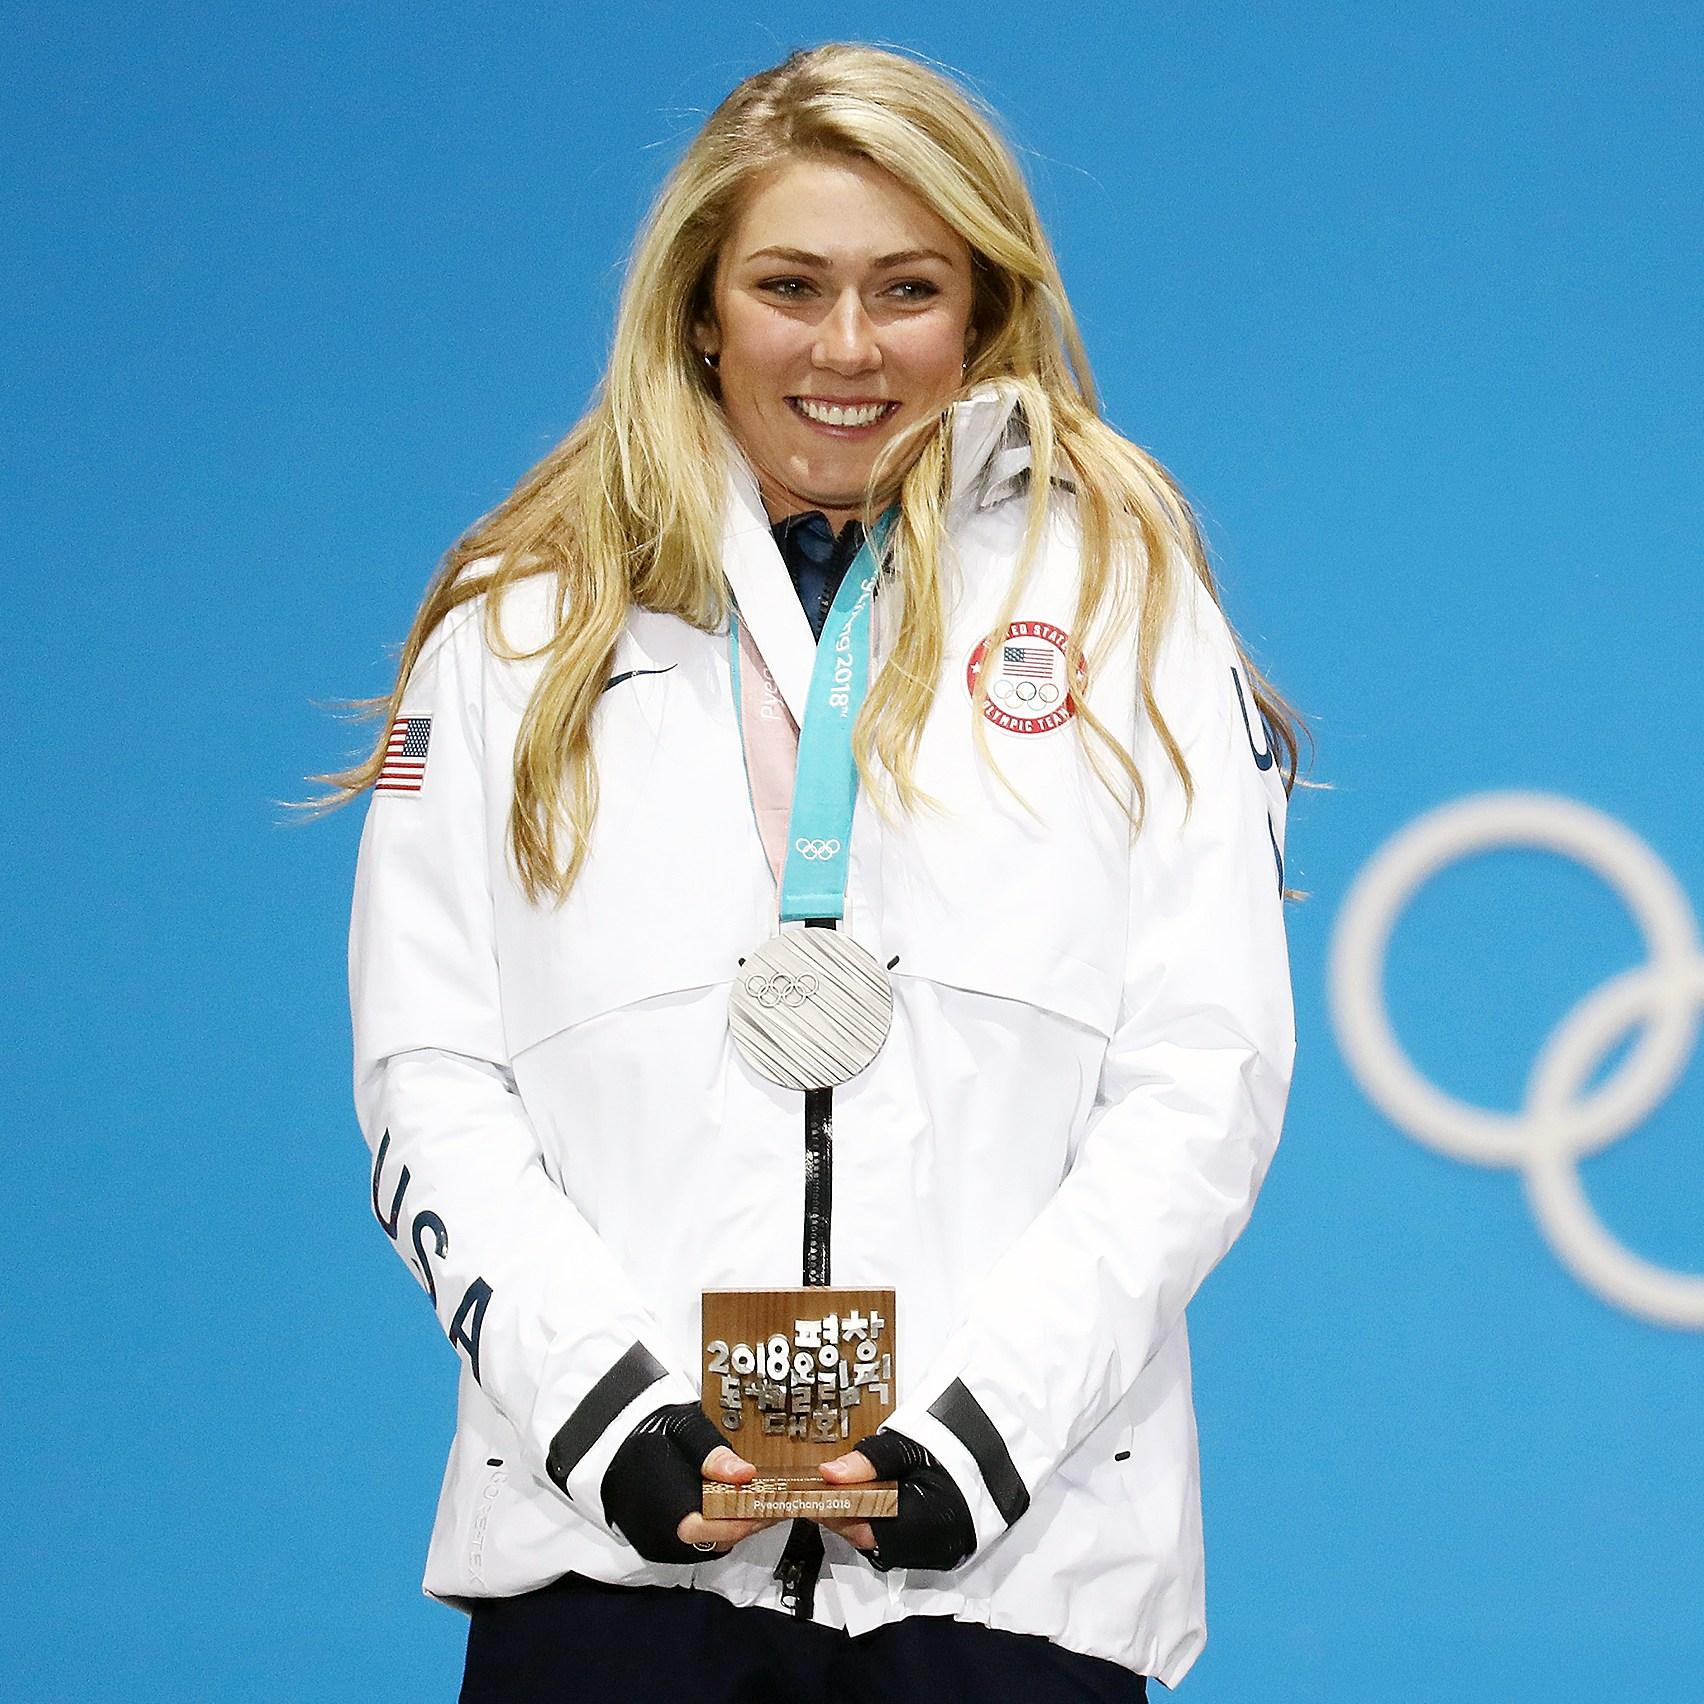 Mikaela Shiffrin PyeongChang 2018 Winter Olympics